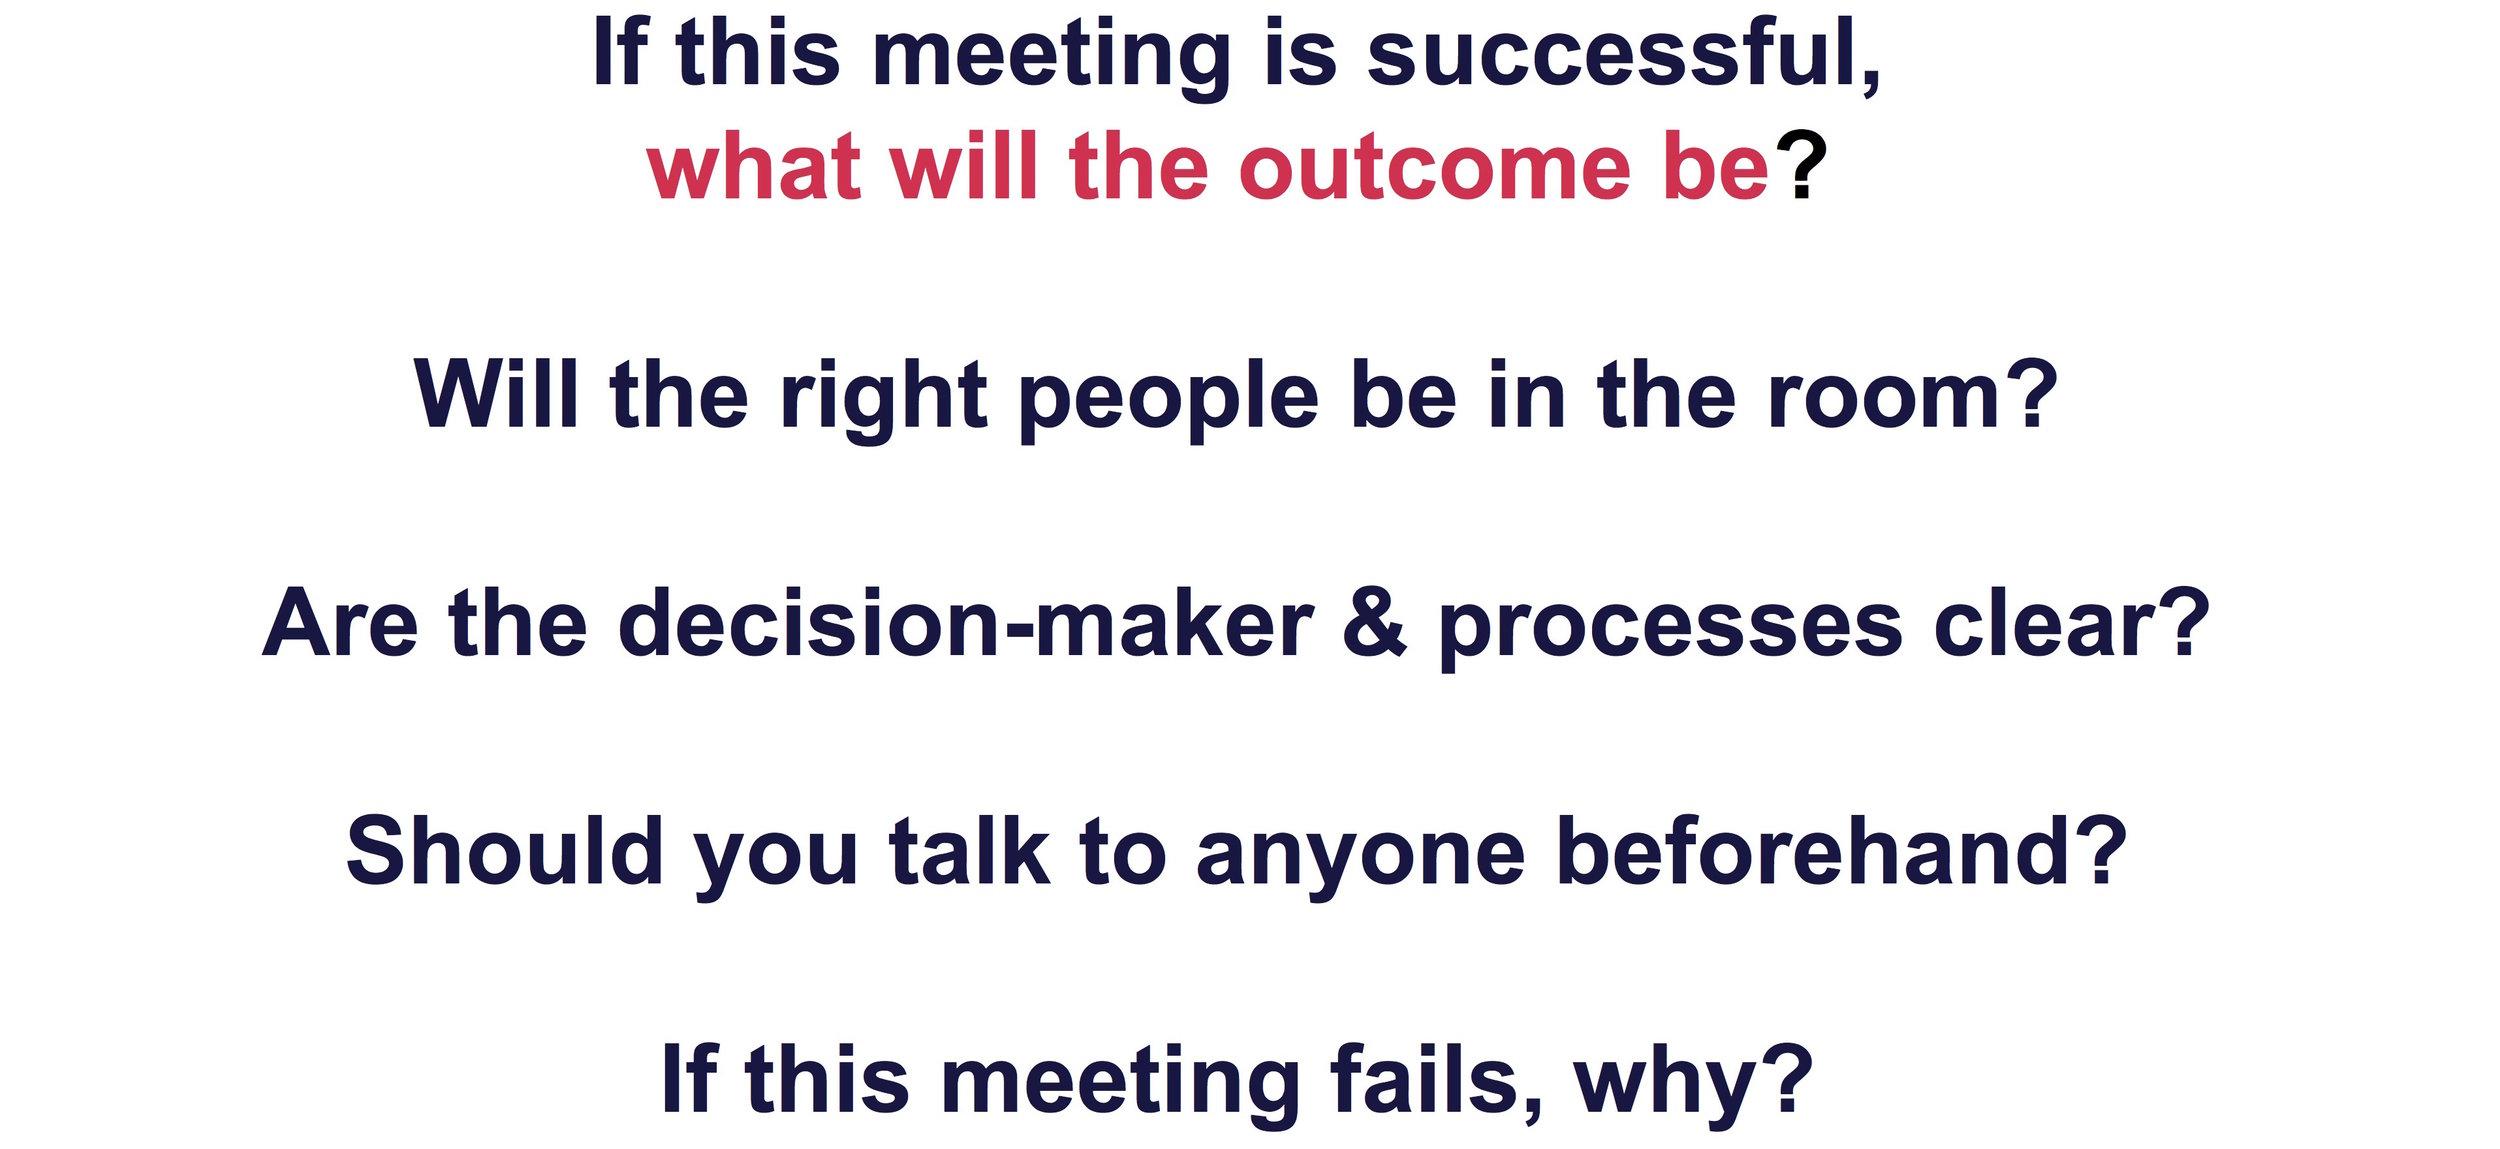 outcome-slide1.jpg